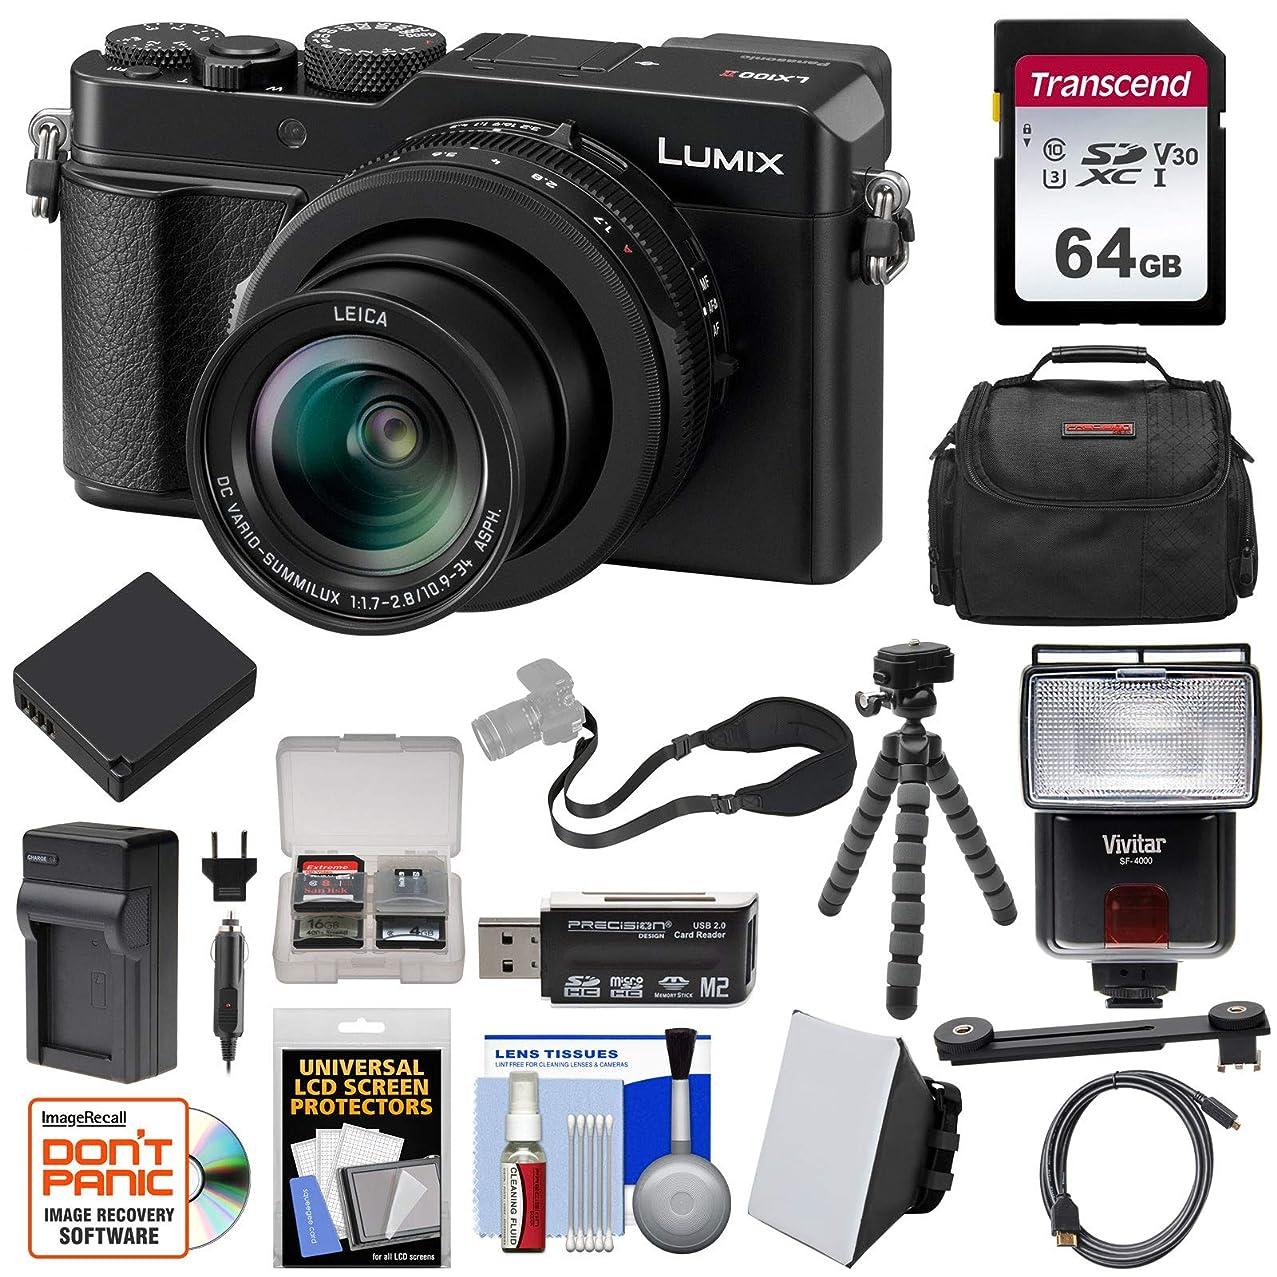 Panasonic Lumix DC-LX100 II 4K Wi-Fi Digital Camera with 64GB Card + Battery & Charger + Case + Tripod + Flash + Kit